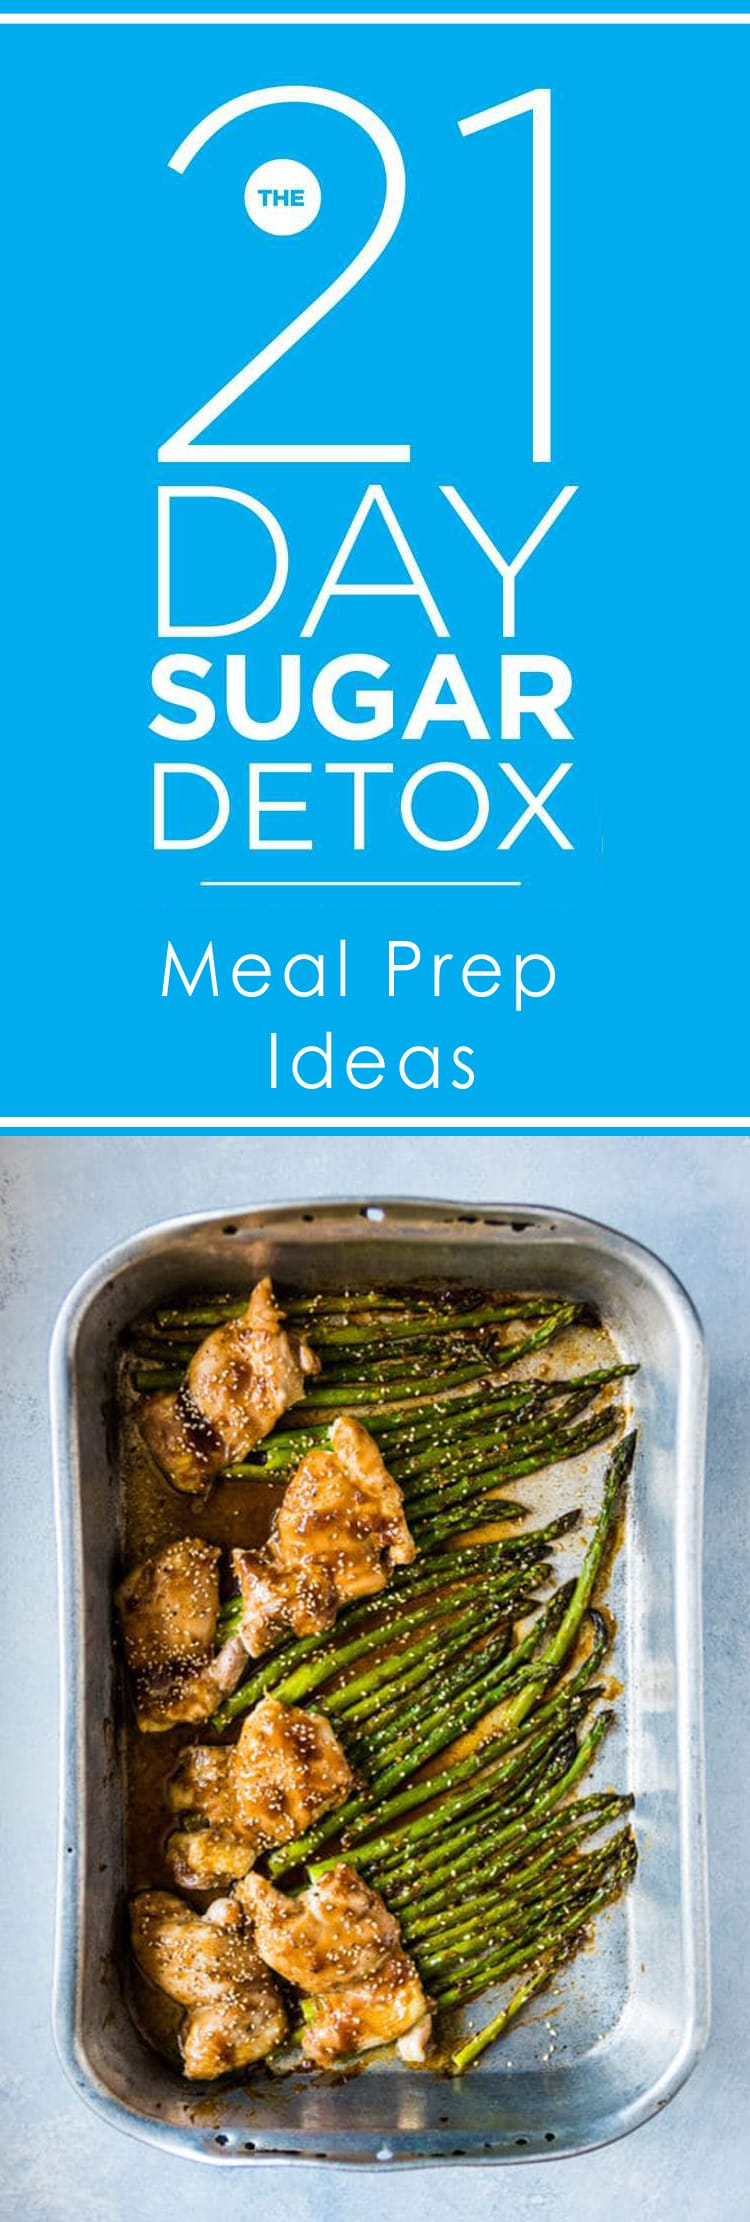 21 Day Sugar Detox Meal Prep Ideas Pinterest